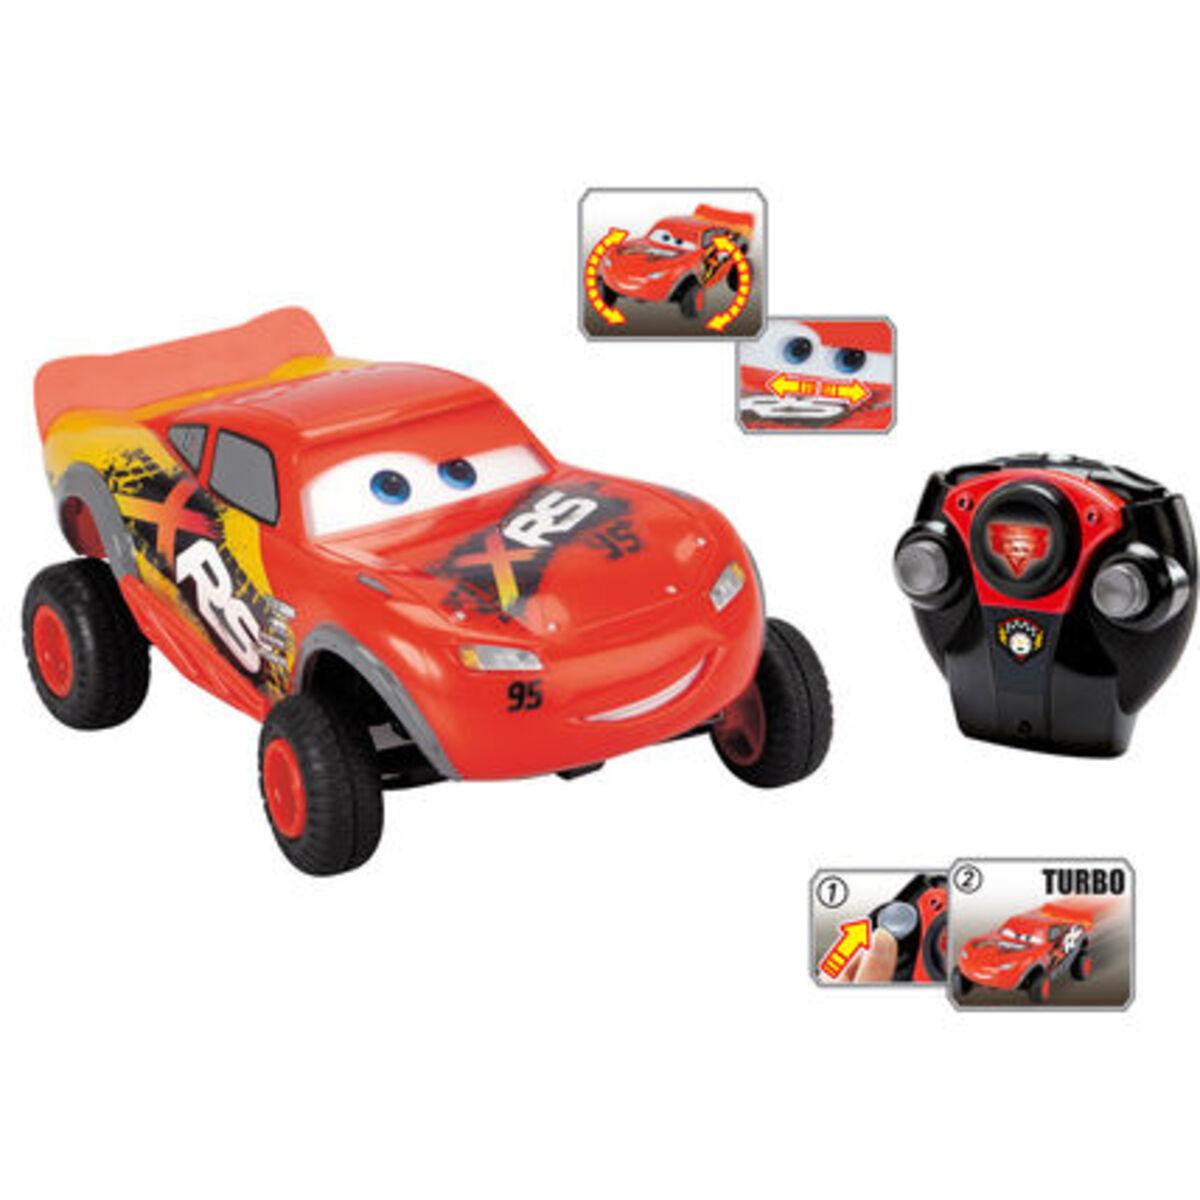 Bild 4 von Dickie Toys Disney Cars RC Lightning McQueen XRS